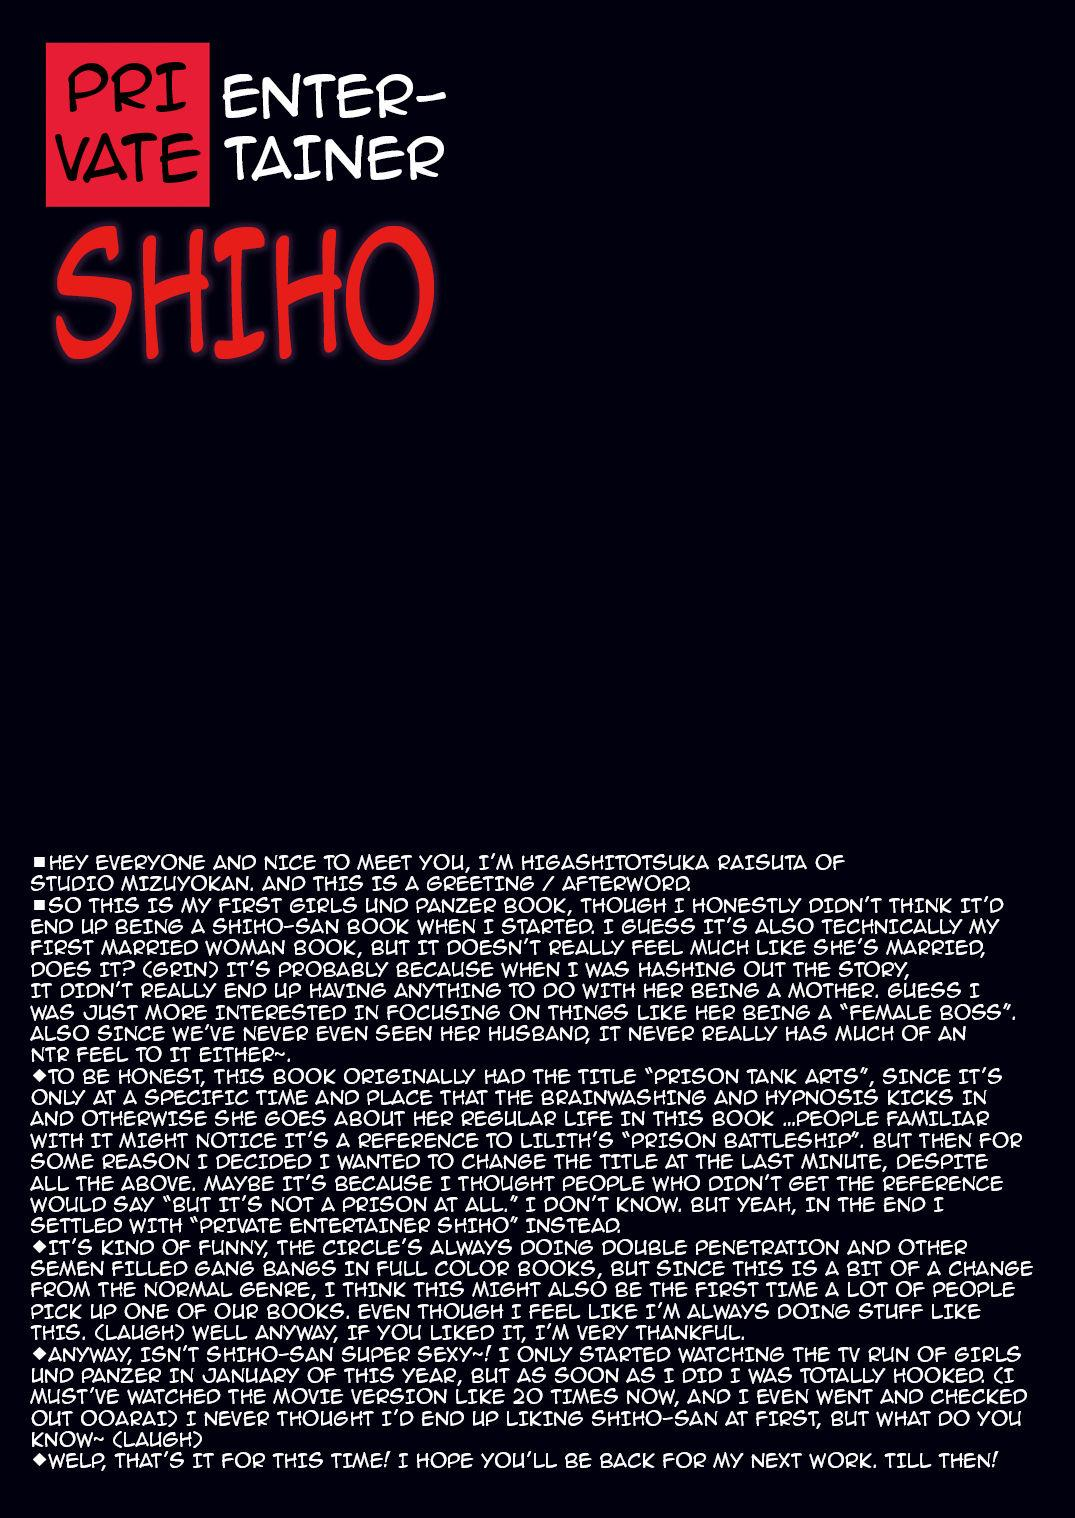 Ura Settai Shiho   Private Entertainer Shiho 34